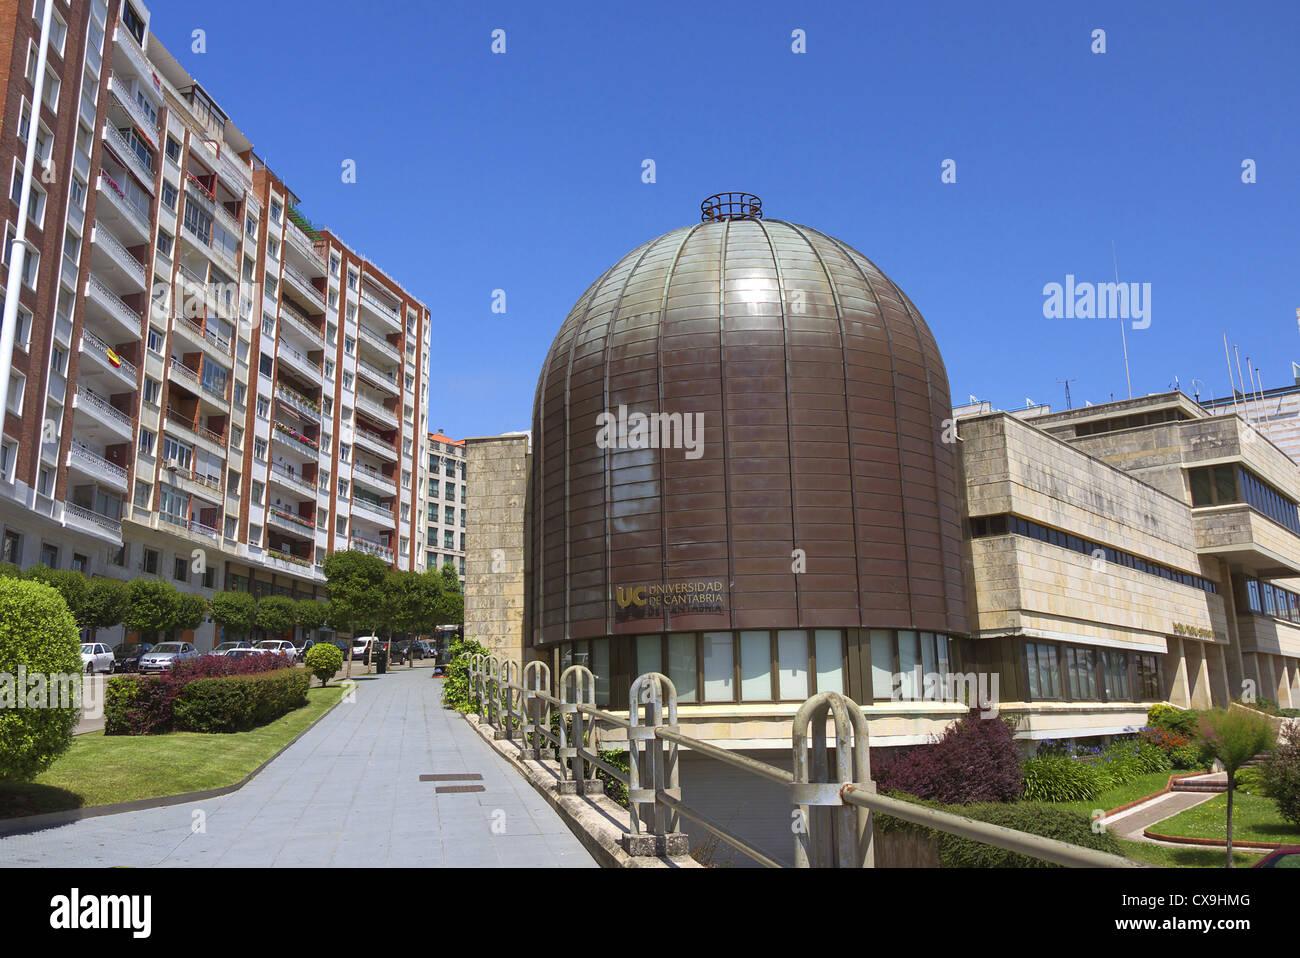 University of Cantabria in Santander, Spain. - Stock Image